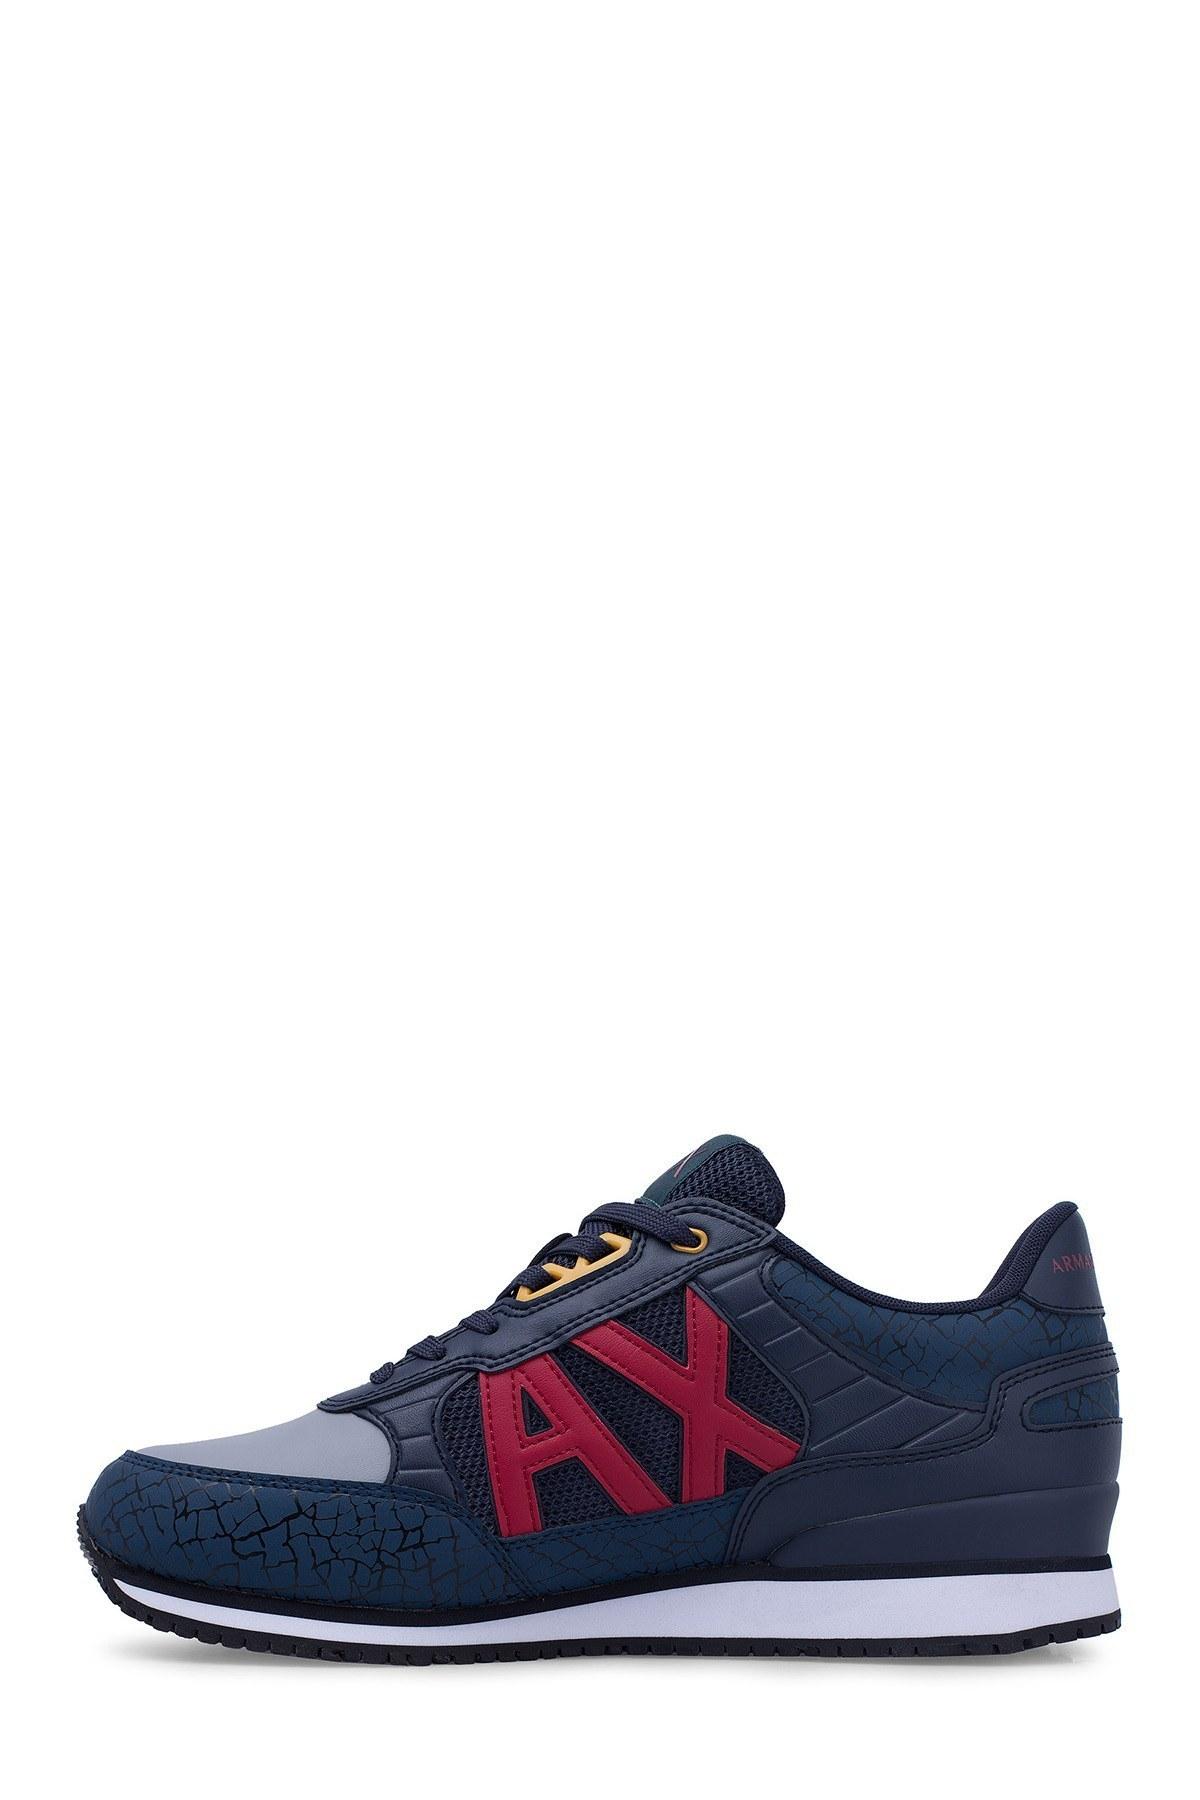 Armani Exchange Erkek Ayakkabı XUX031 XV200 A905 LACİVERT